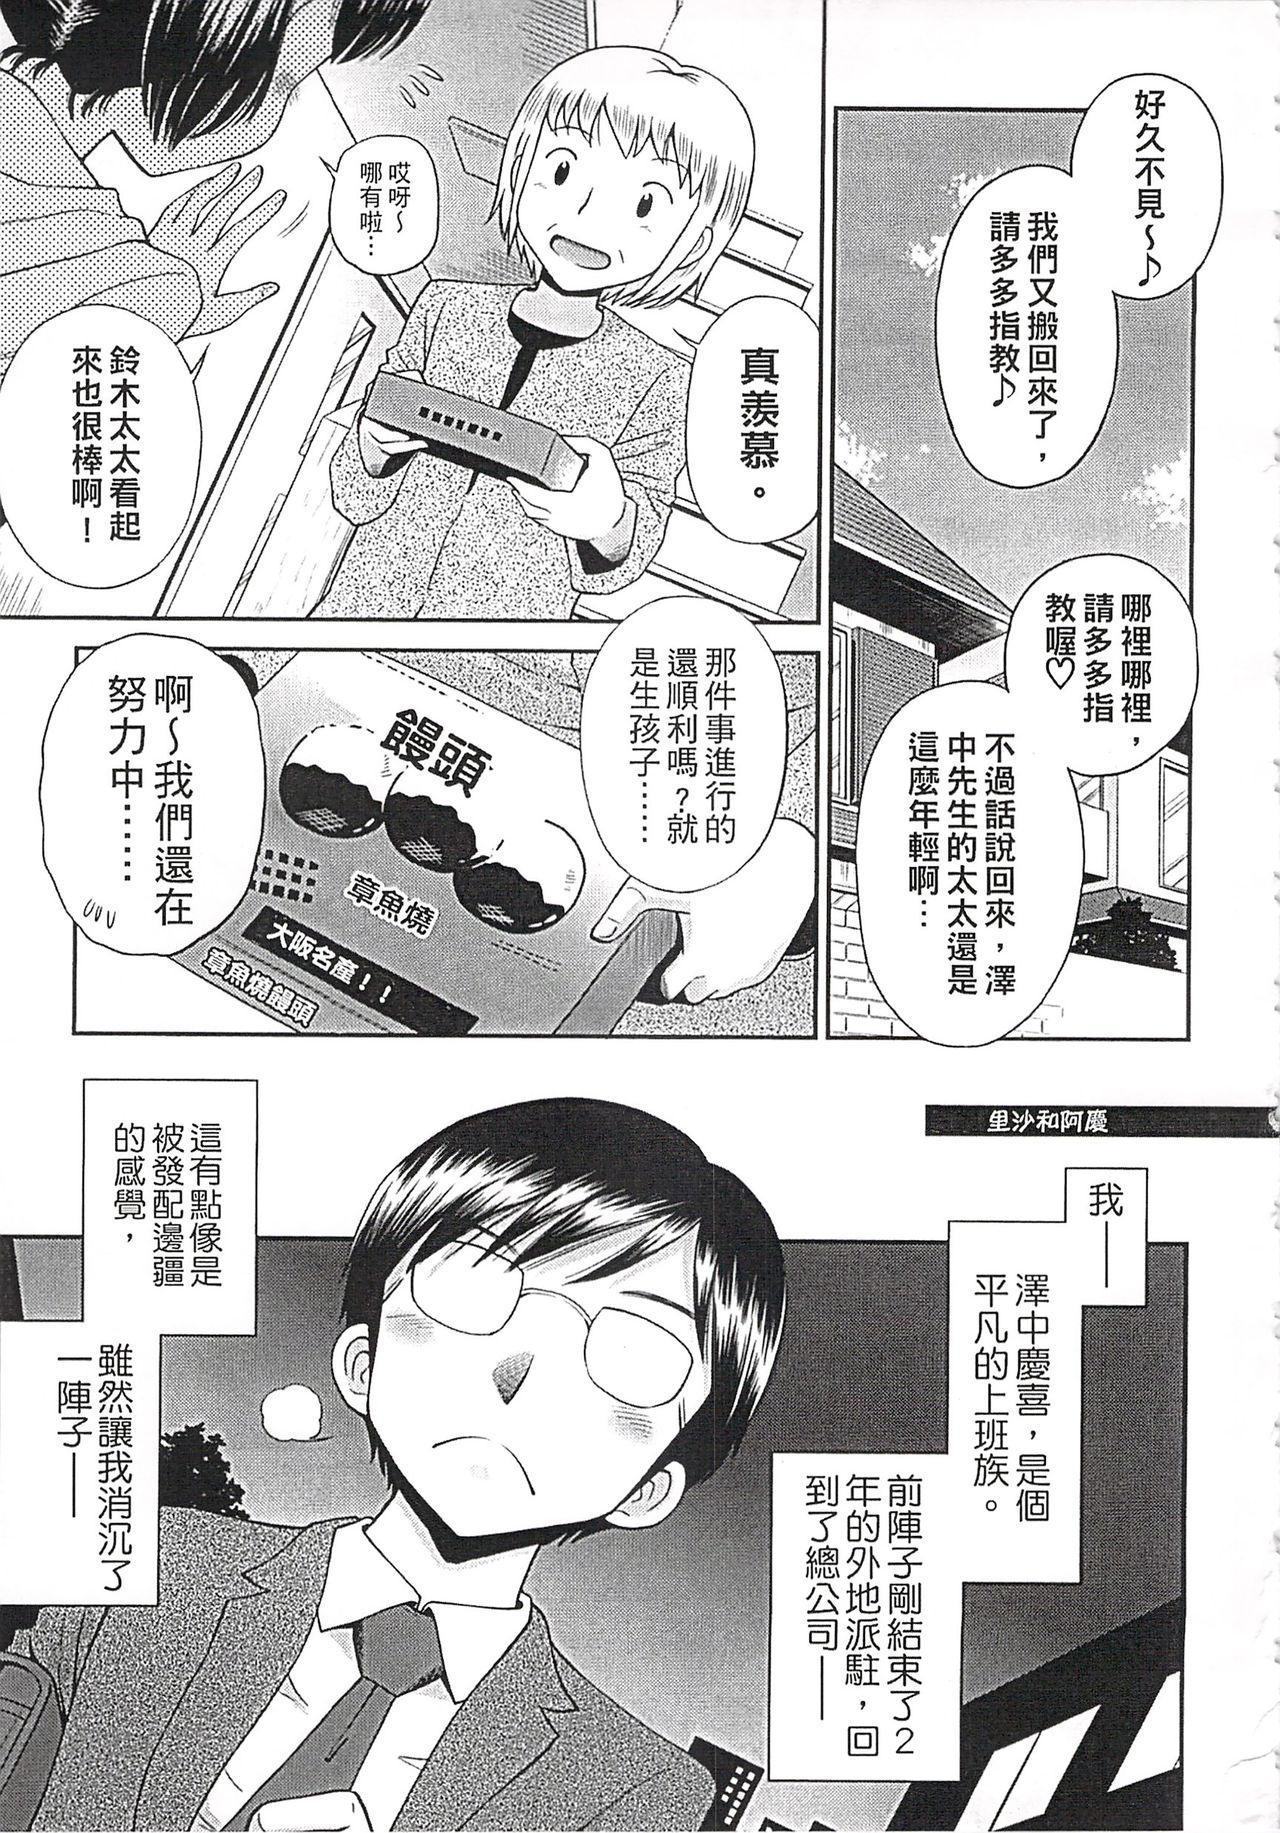 Kore demo Otona Desu Kedo!? Mrs.LOLITA Kanzenban   人家是大人啦! ~Mrs.LOLITA完全版 134